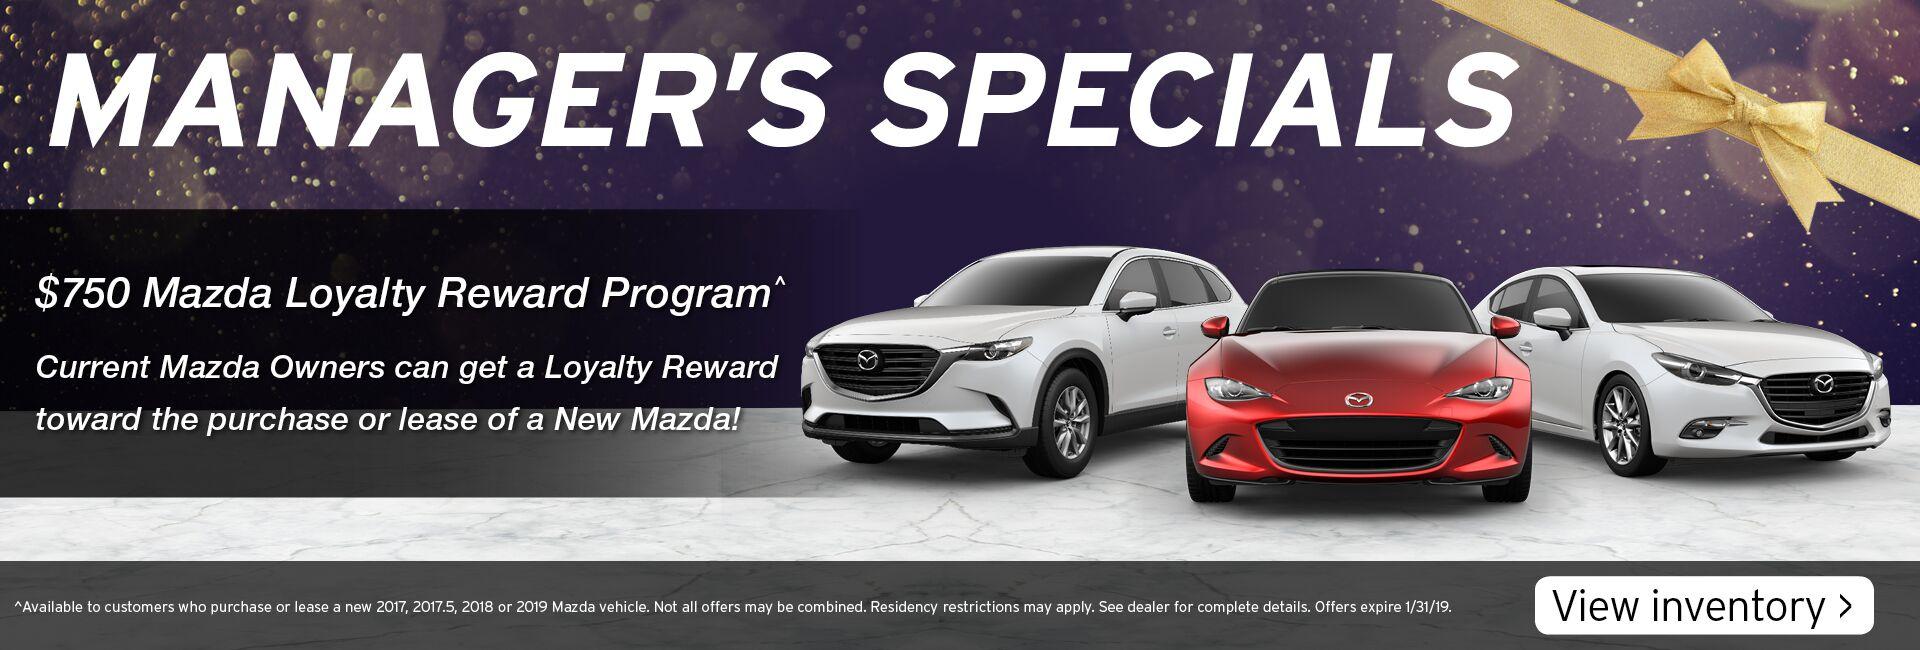 Mazda Dealership Lodi Nj Used Cars Of Miata Fuel Filter Location Managers Specials